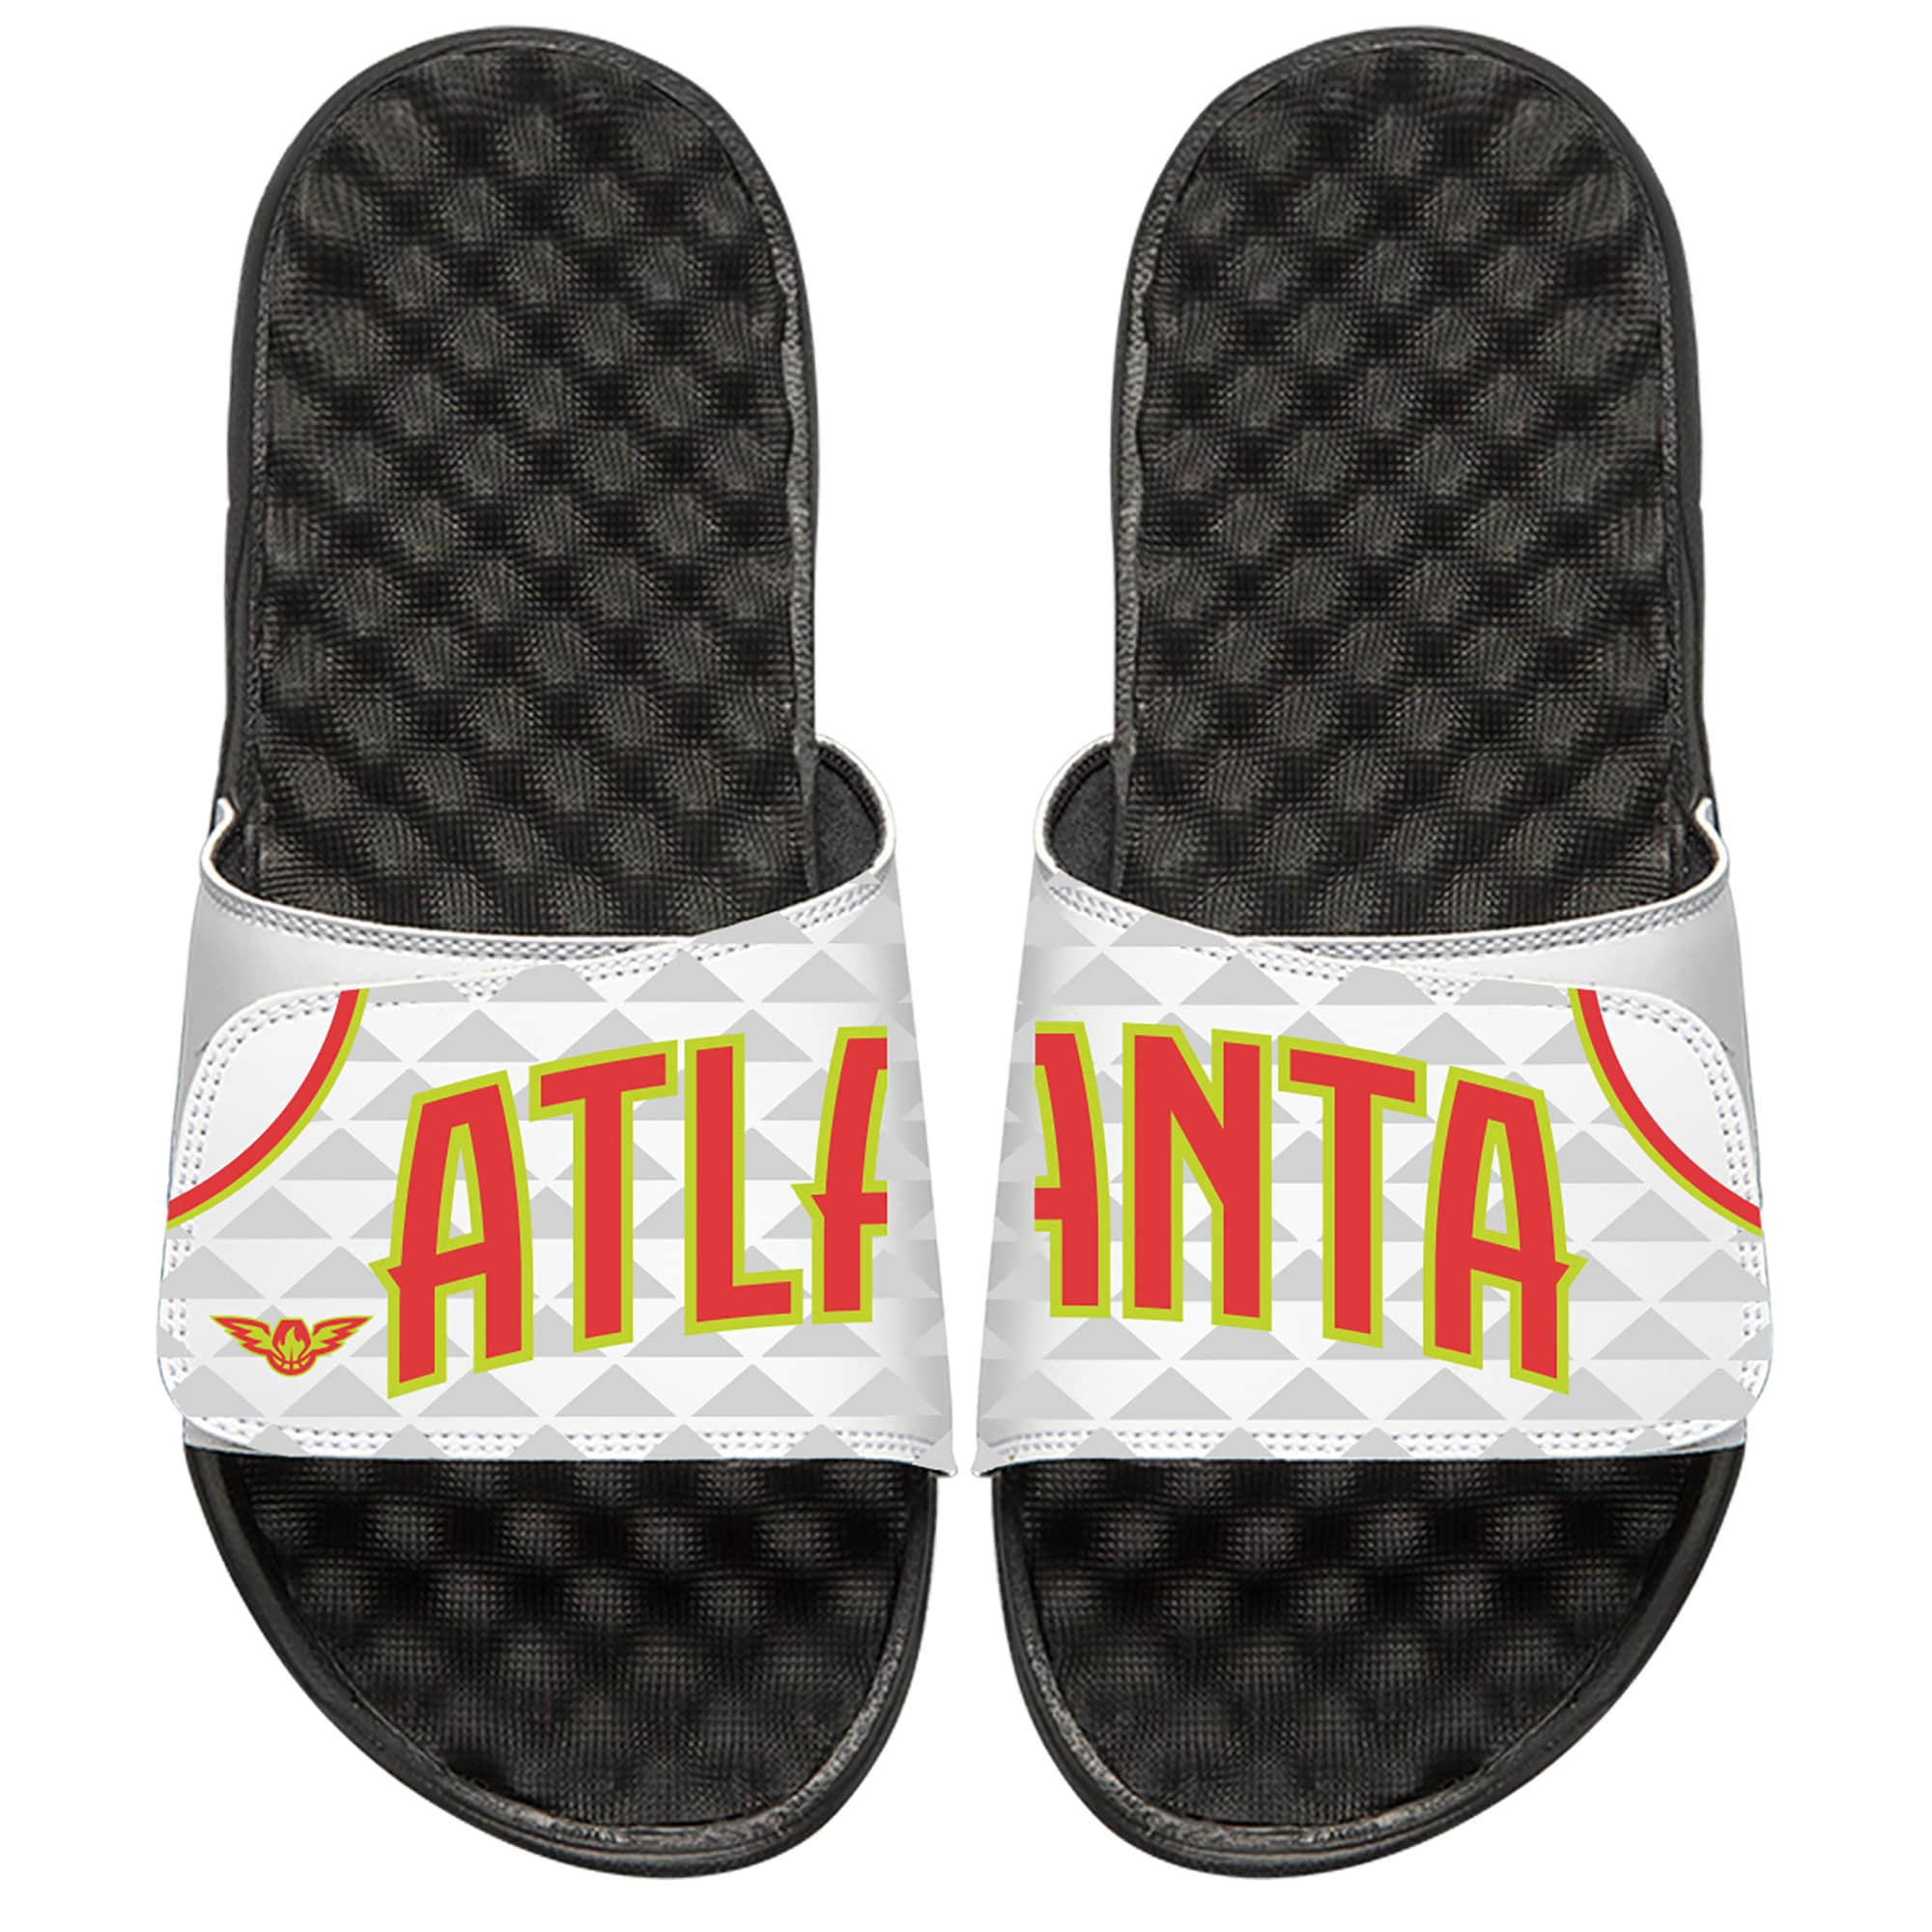 Atlanta Hawks ISlide Youth Home Jersey Slide Sandals - White